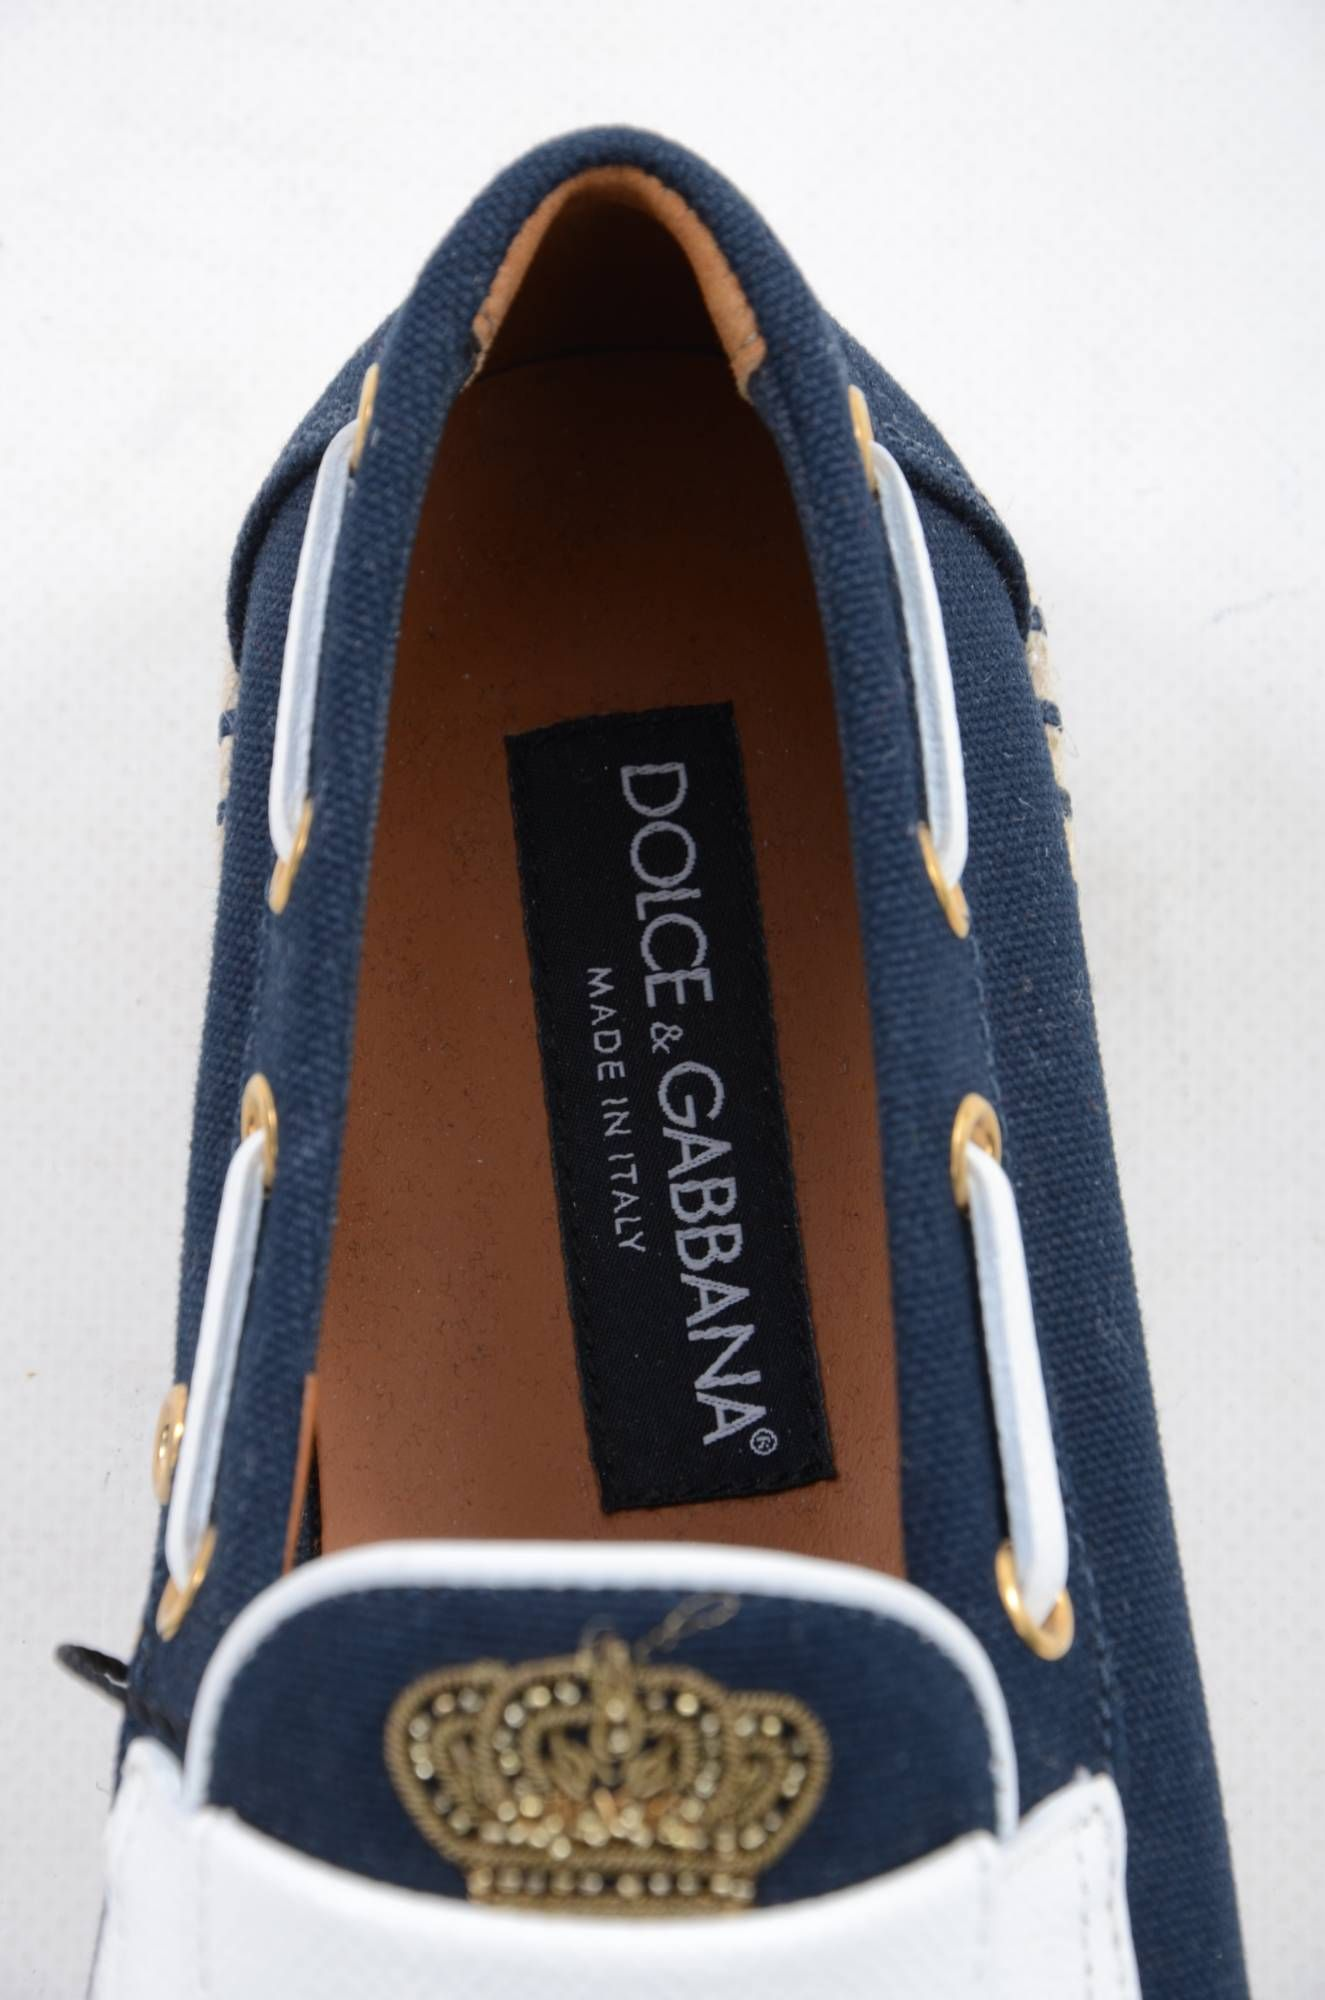 Dolce & Gabbana Men Shield Loafers